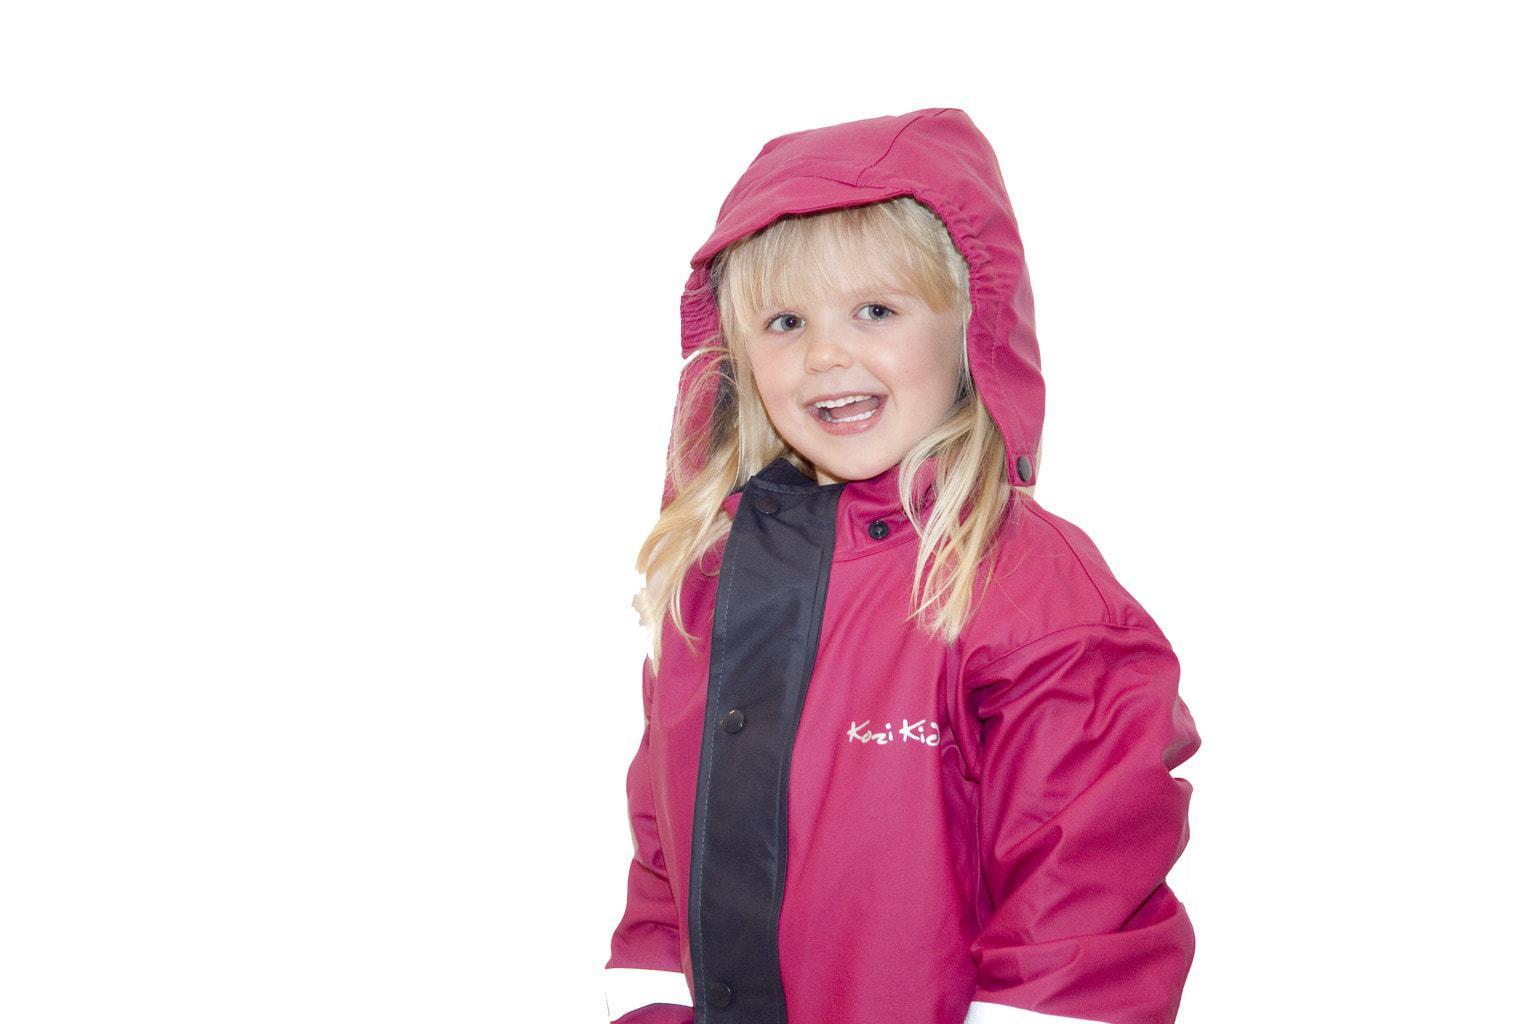 Wet Wednesdays Waterproof Clothing